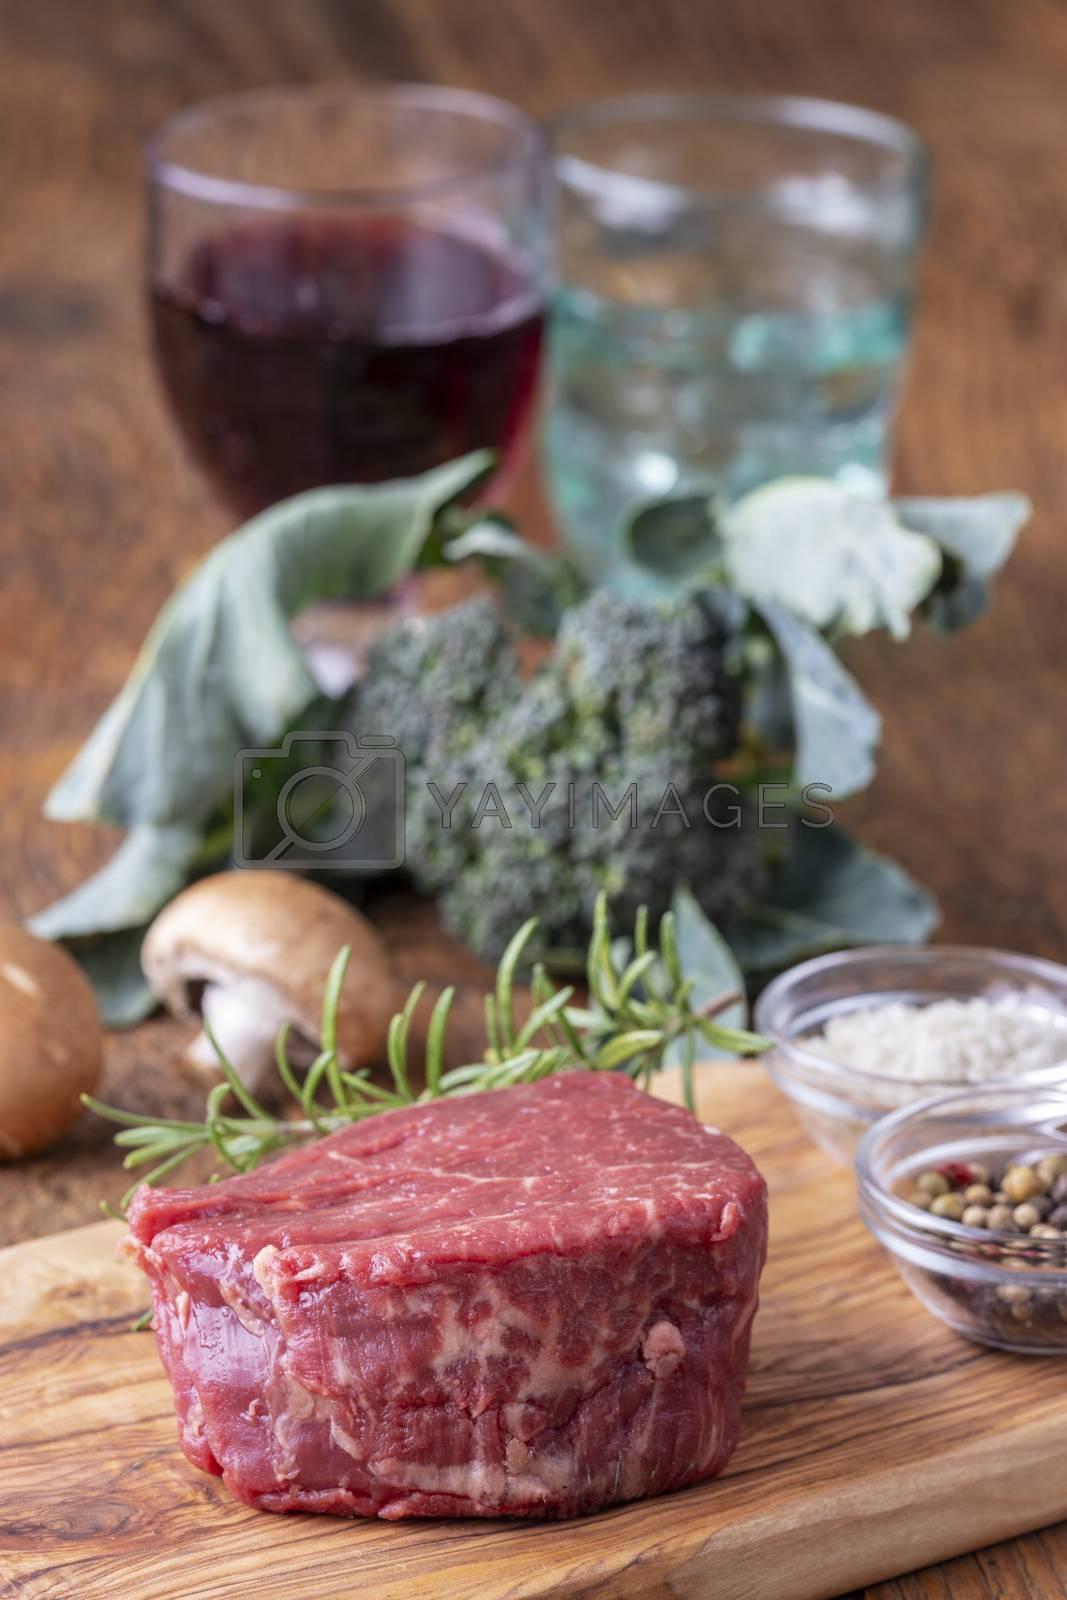 raw steak with broccoli on wood